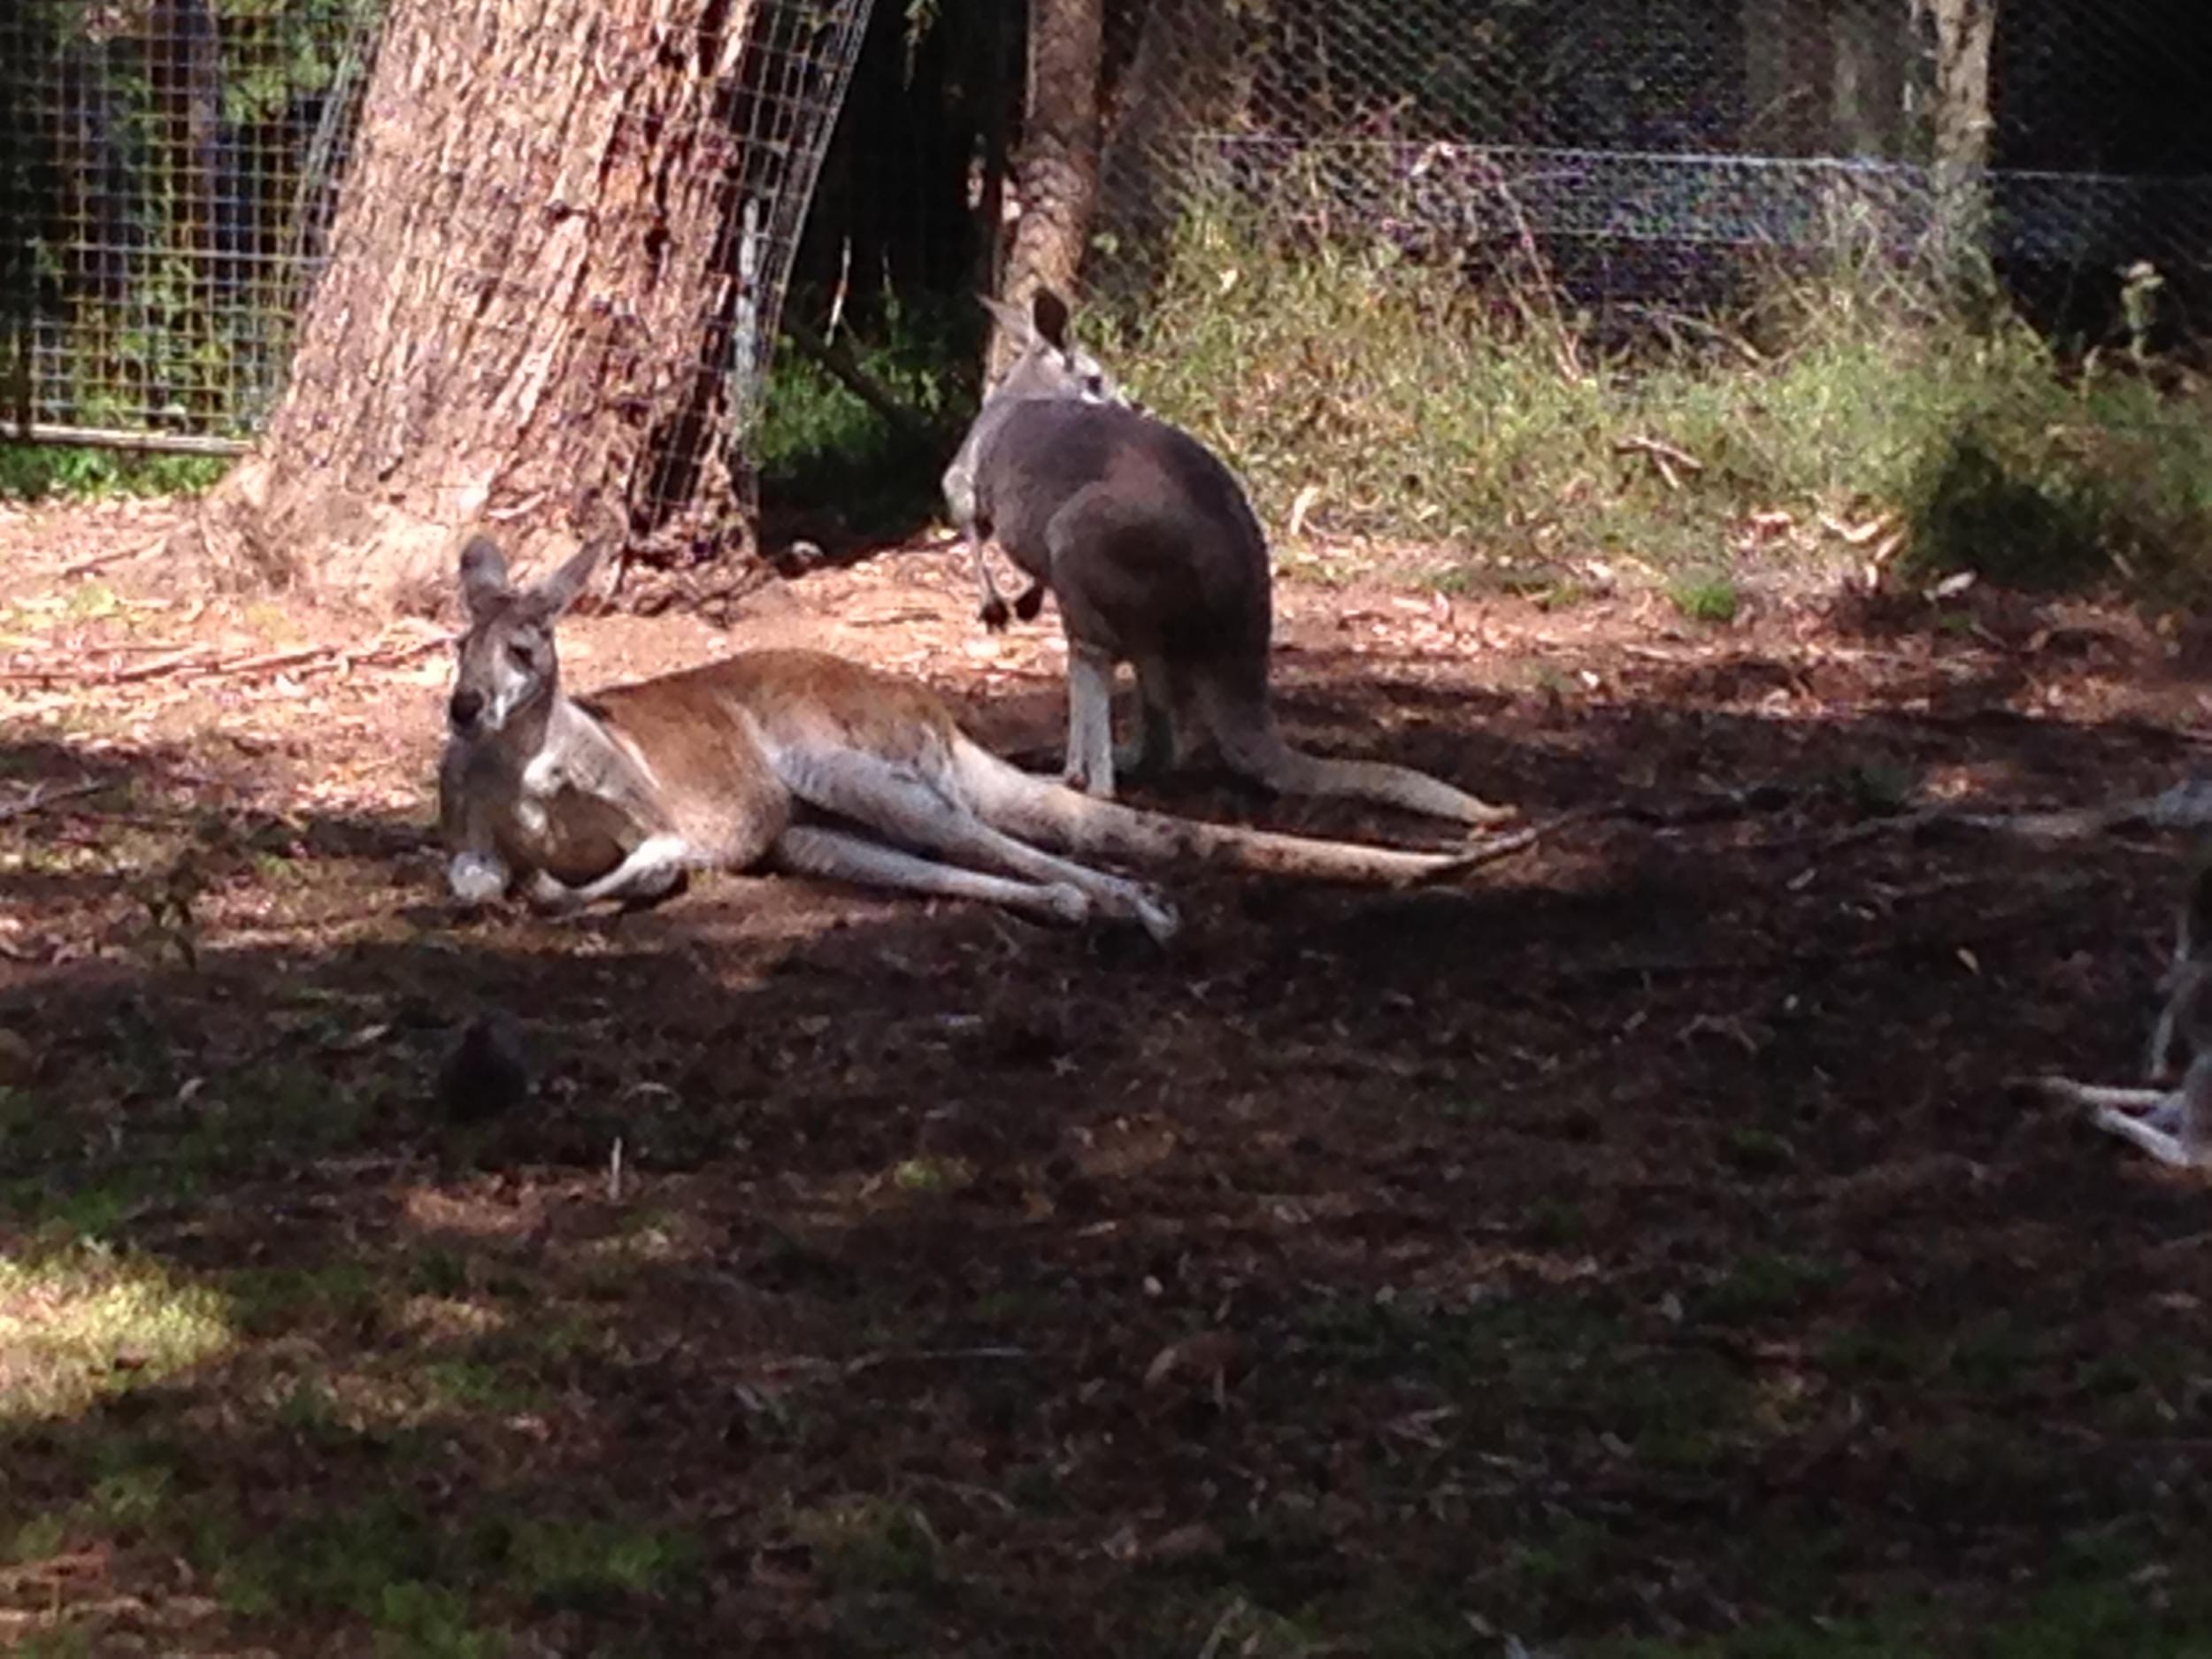 Kangaroos. They LOUNGE, I tell you. Photo credit: Martin Laskowski